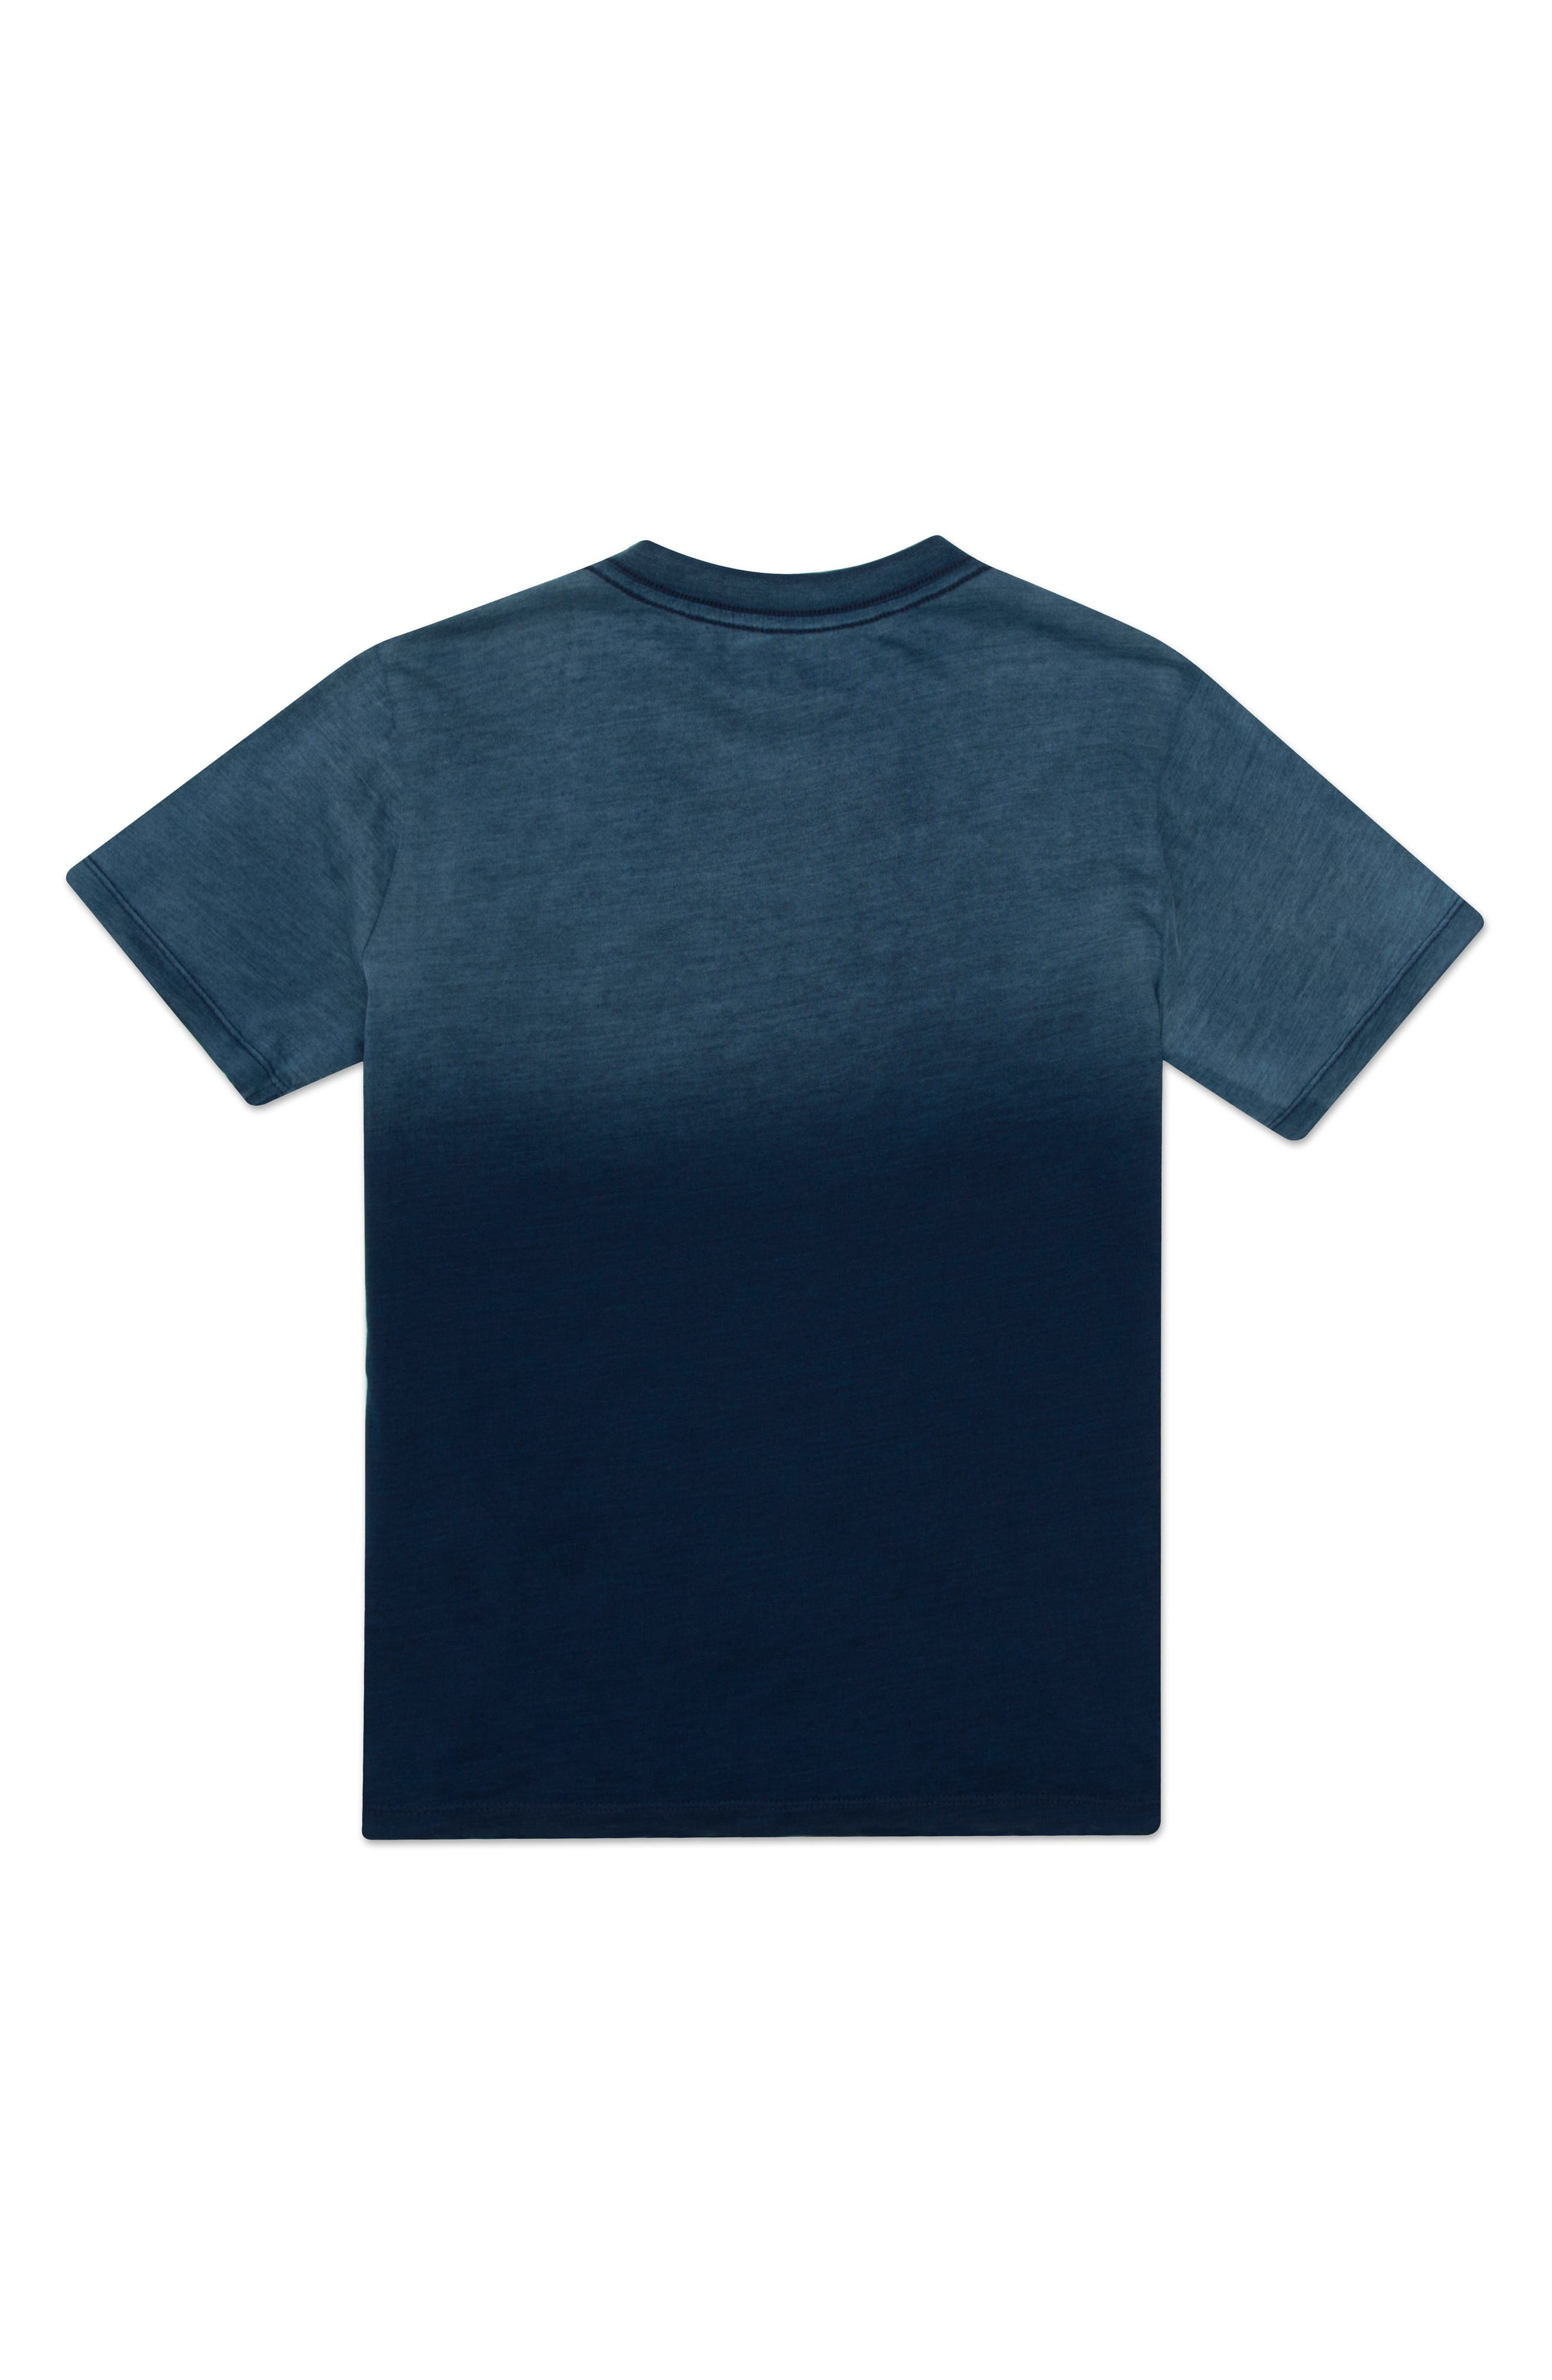 Alternate Image 2  - ag adriano goldschmied kids Dante Crewneck T-Shirt (Toddler Boys & Little Boys)